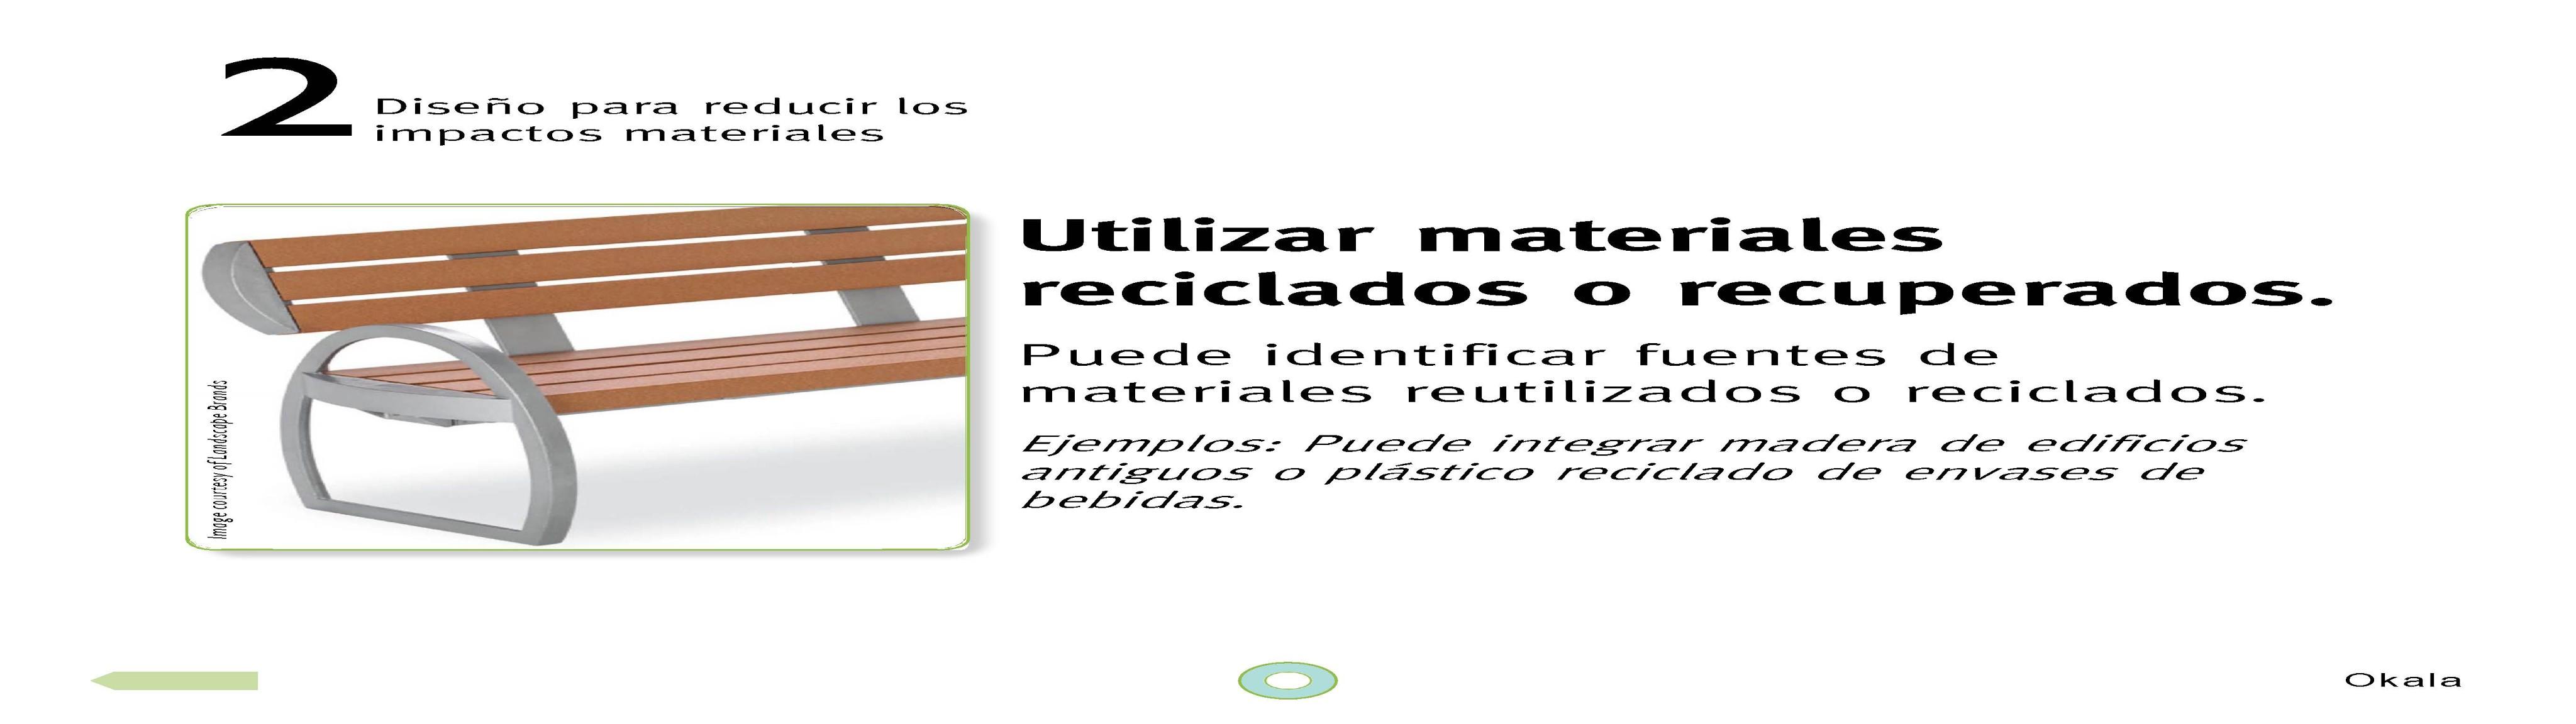 okala-ecodesign-strategy-guide-2012-spanish.new_page_12-1